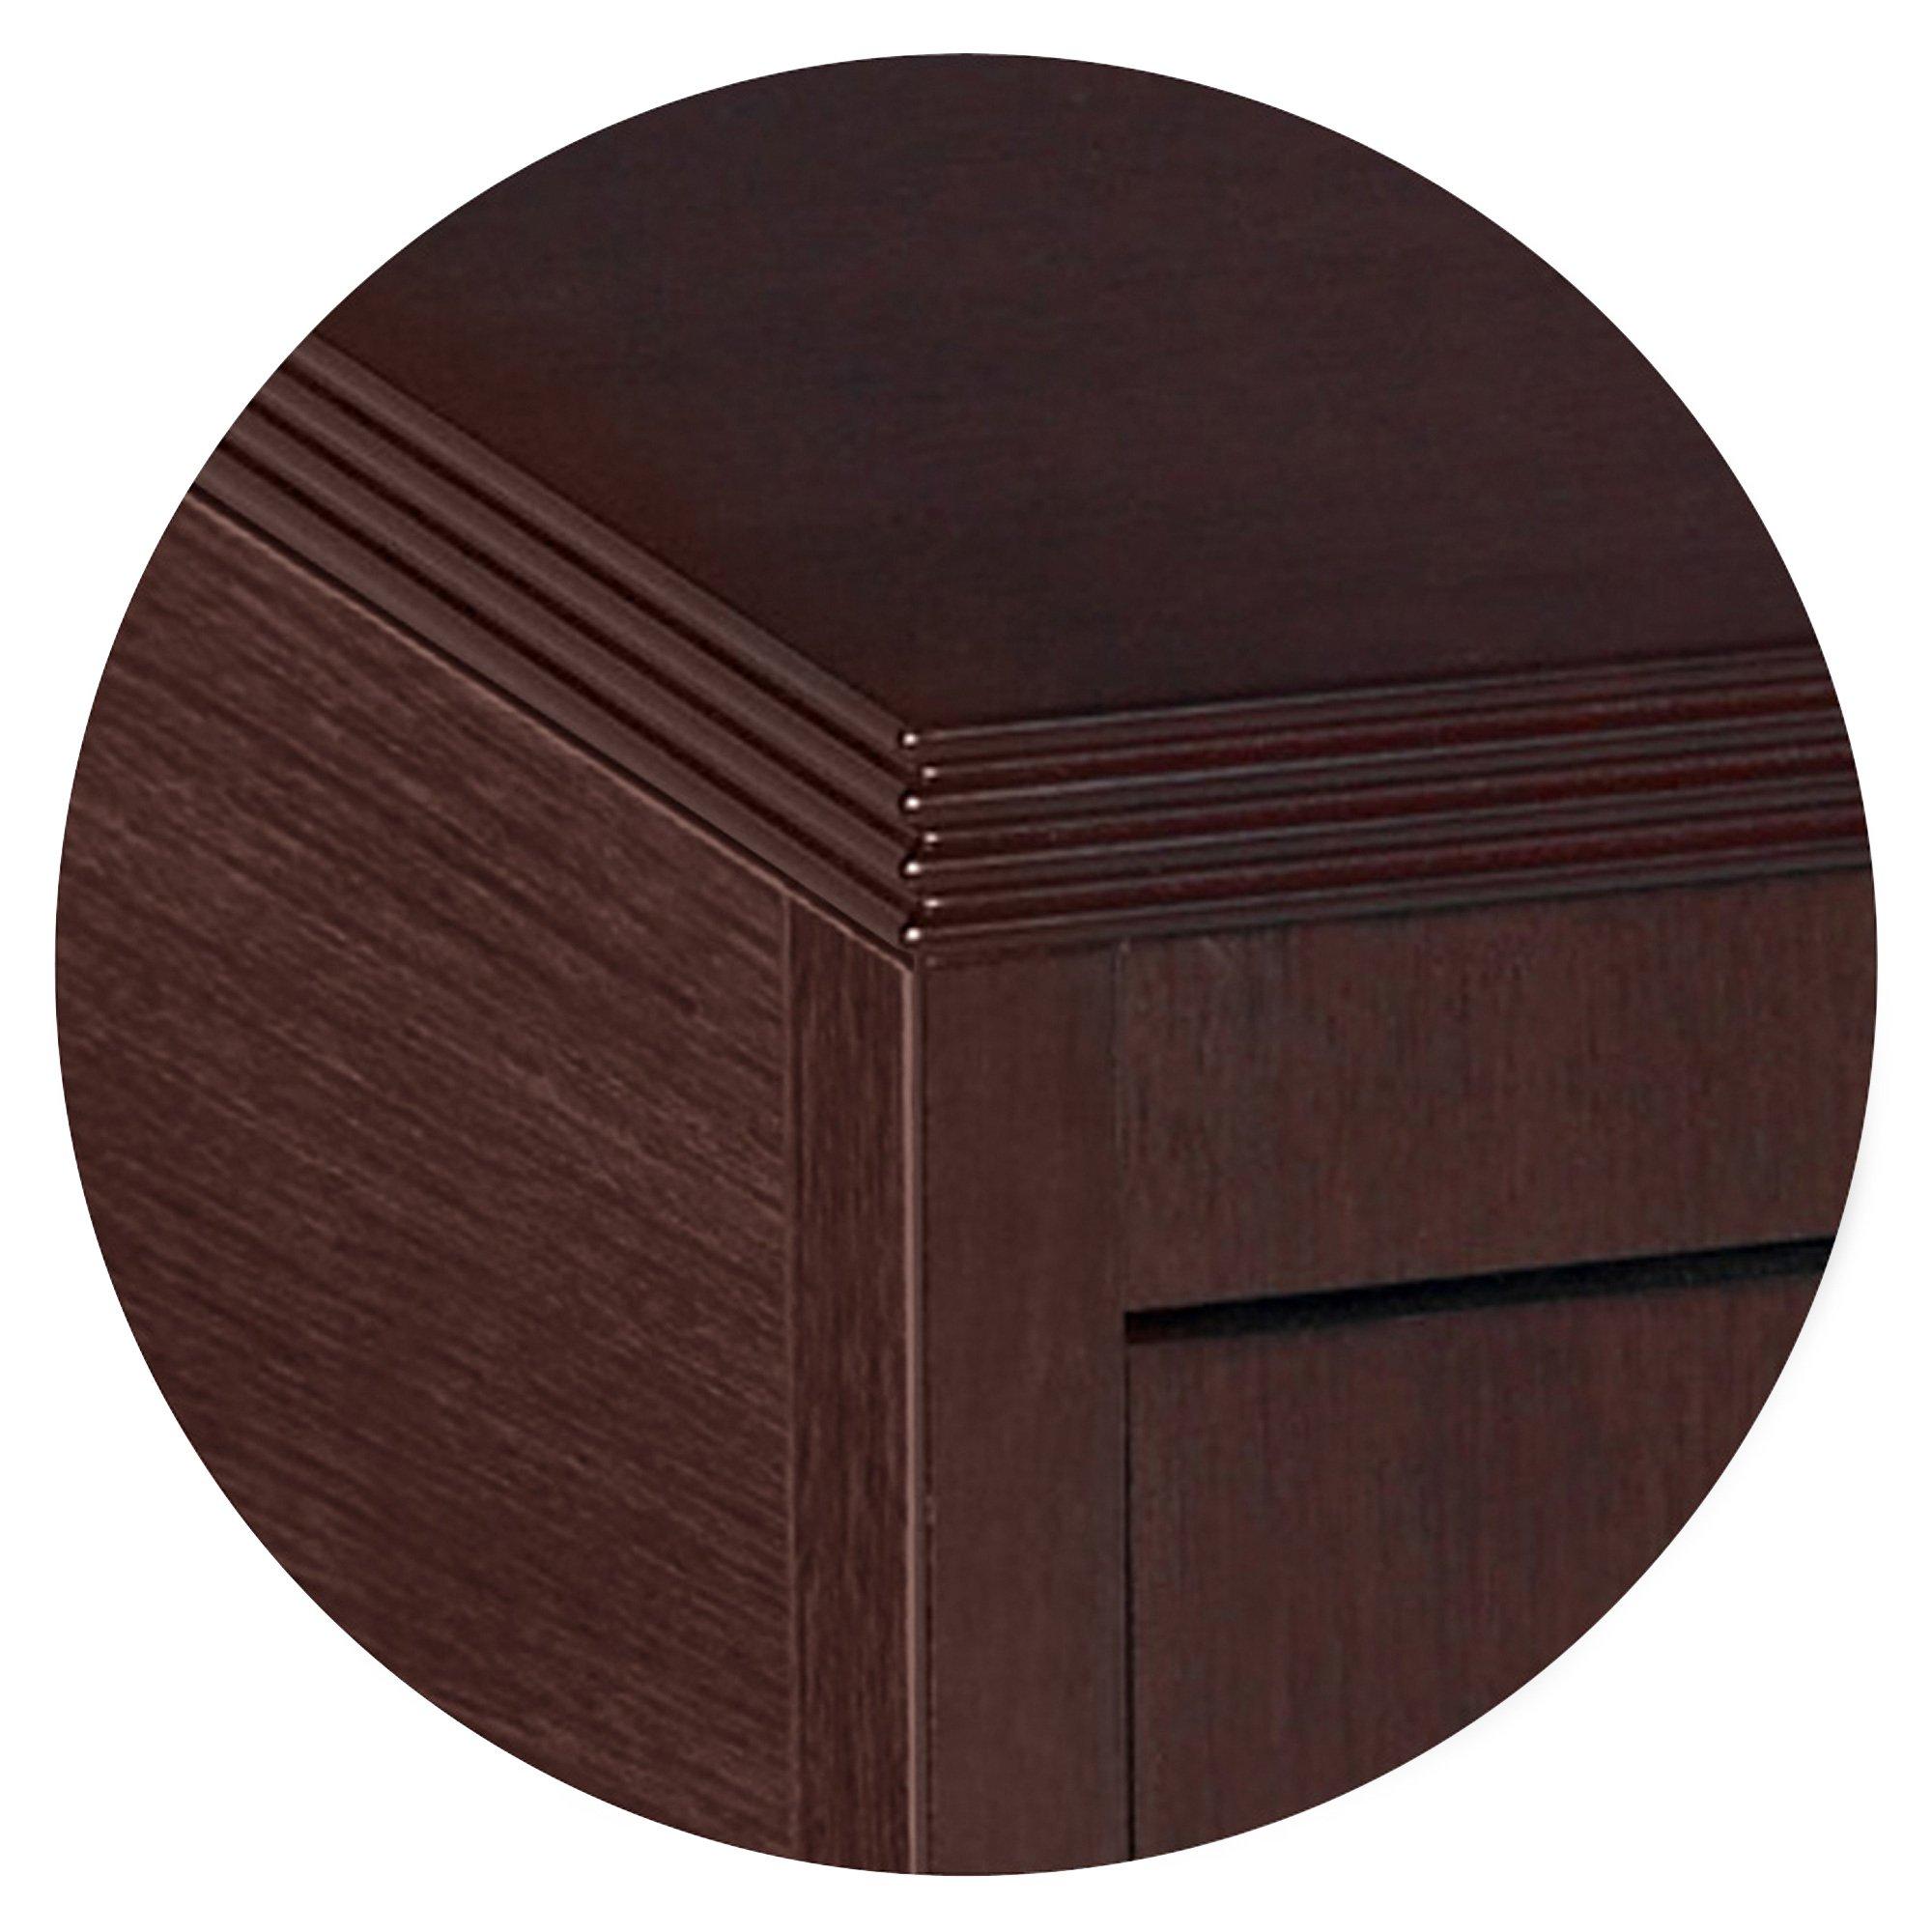 Lorell Pedestal Desk, Box/Box/File, 15-3/4 by 22 by 27-1/2-Inch, Mahogany